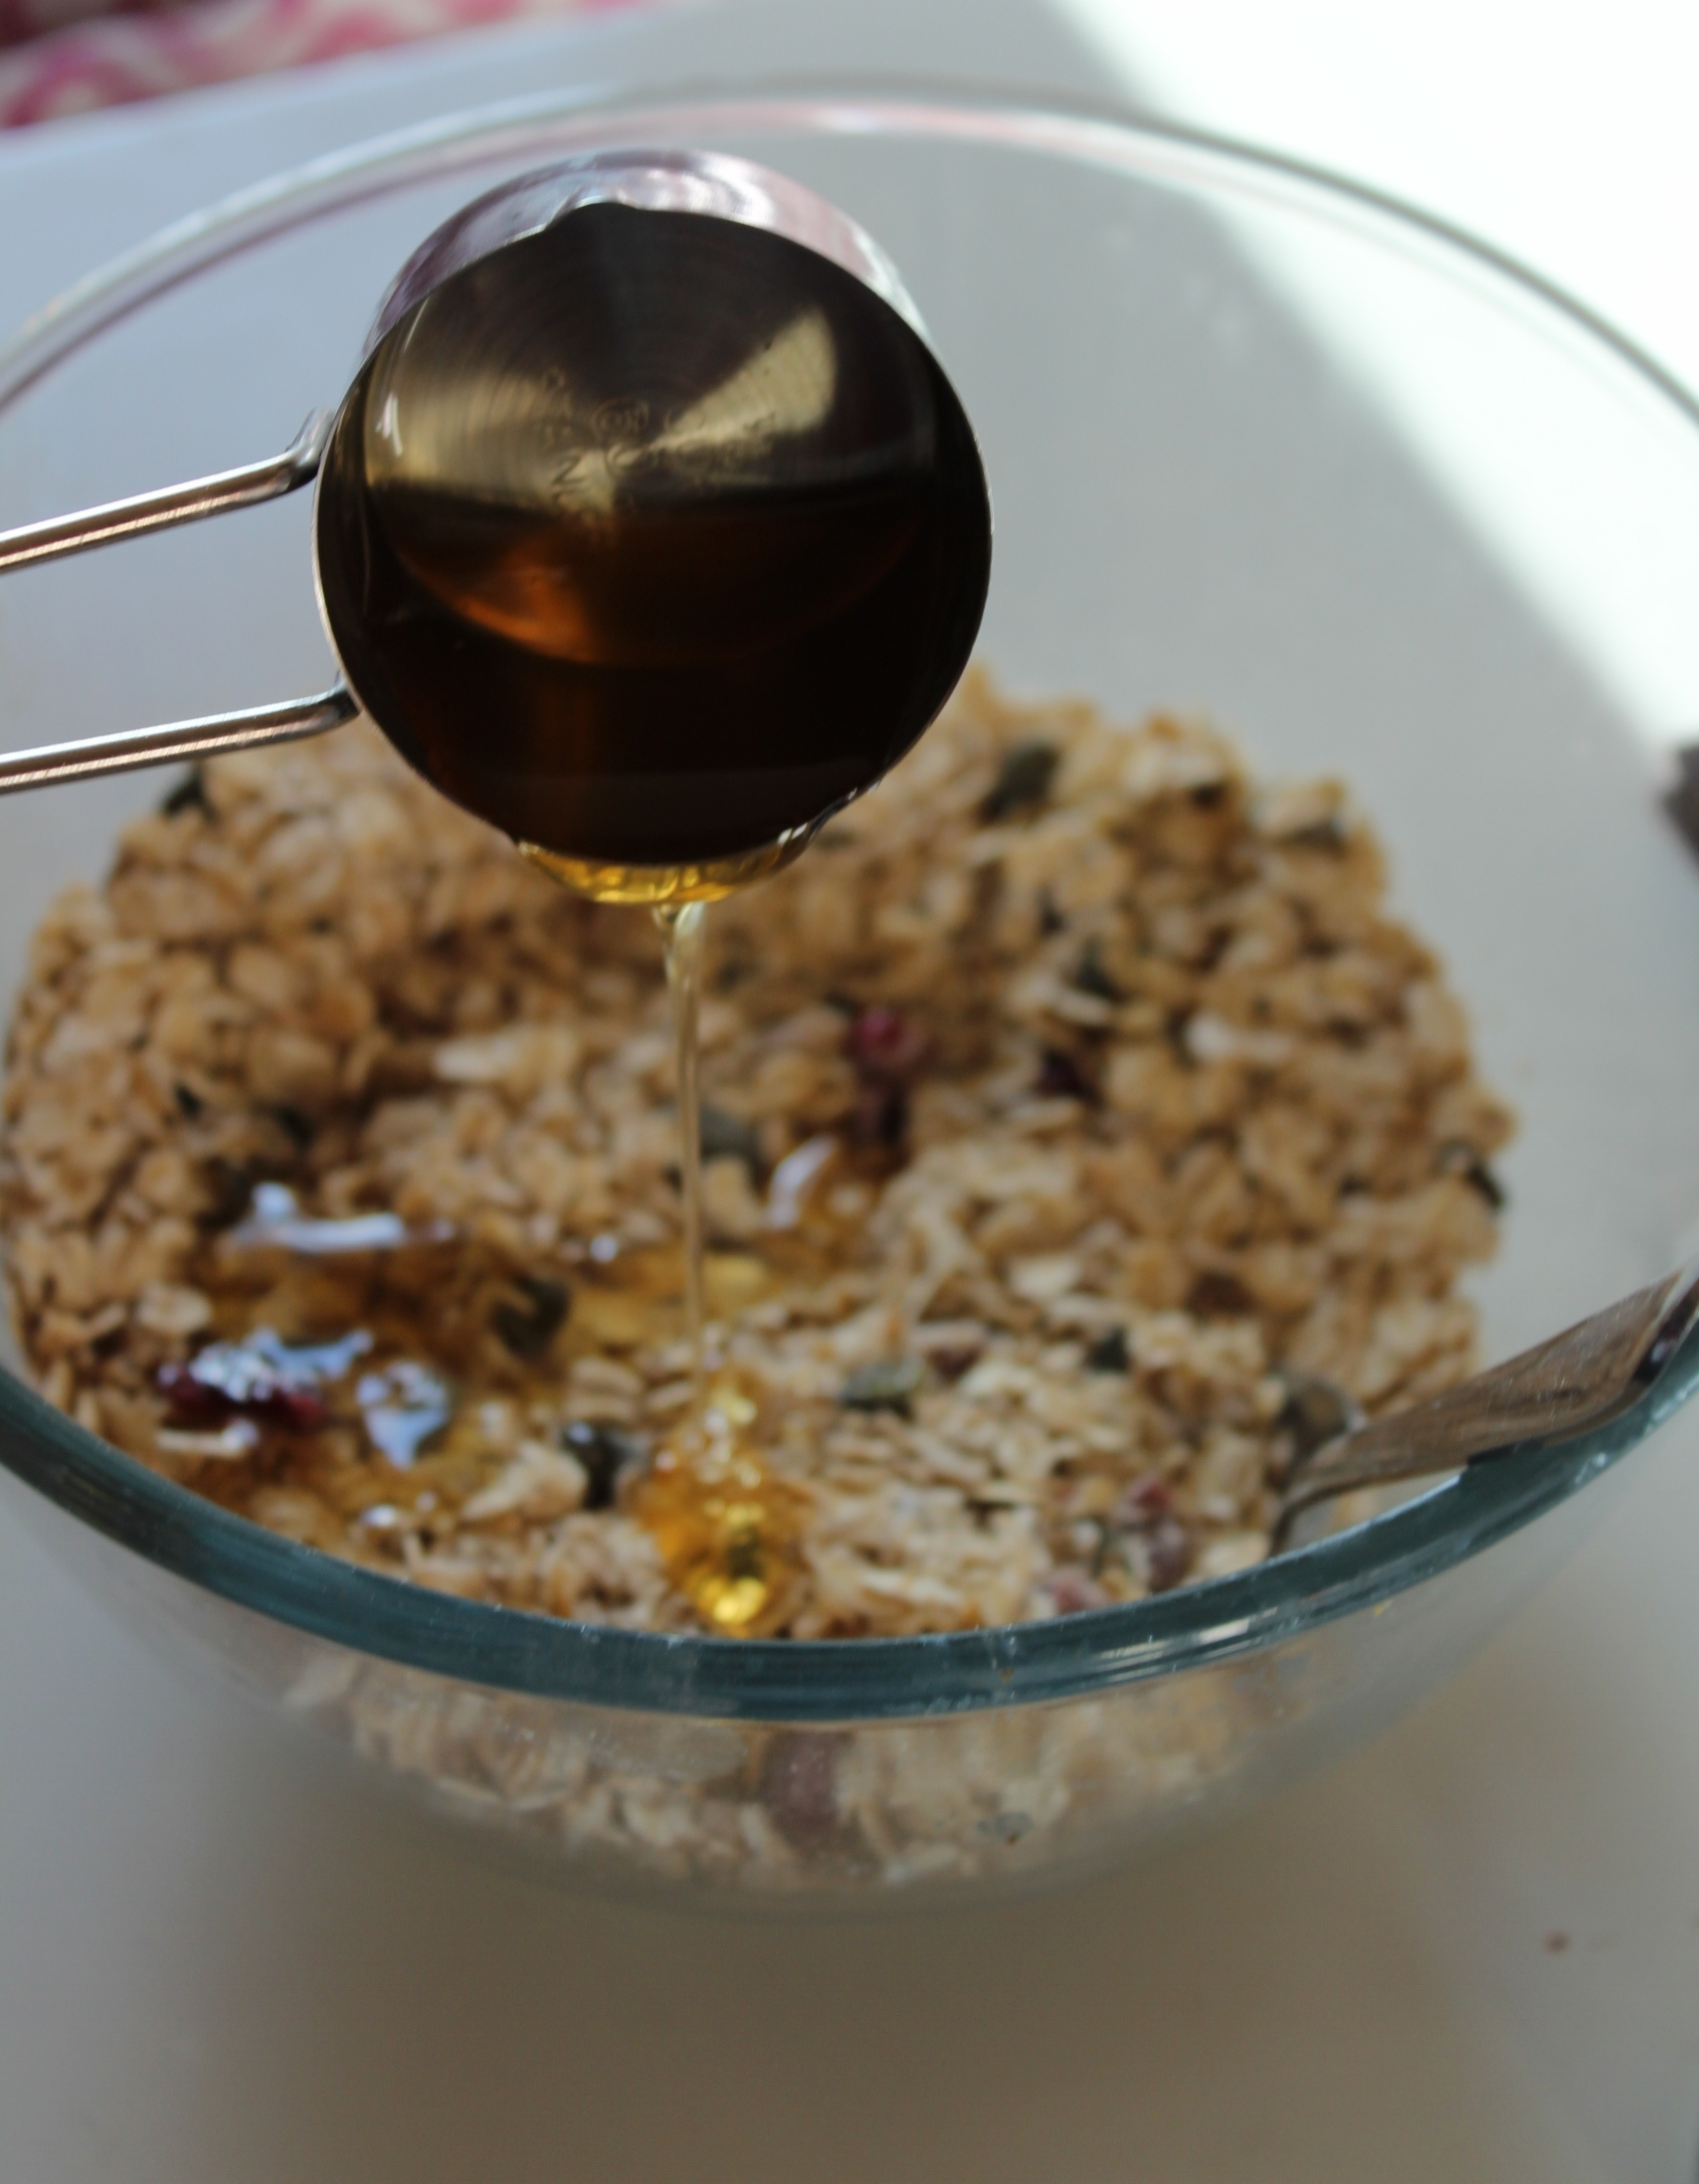 Granola-honey-dripping.JPG